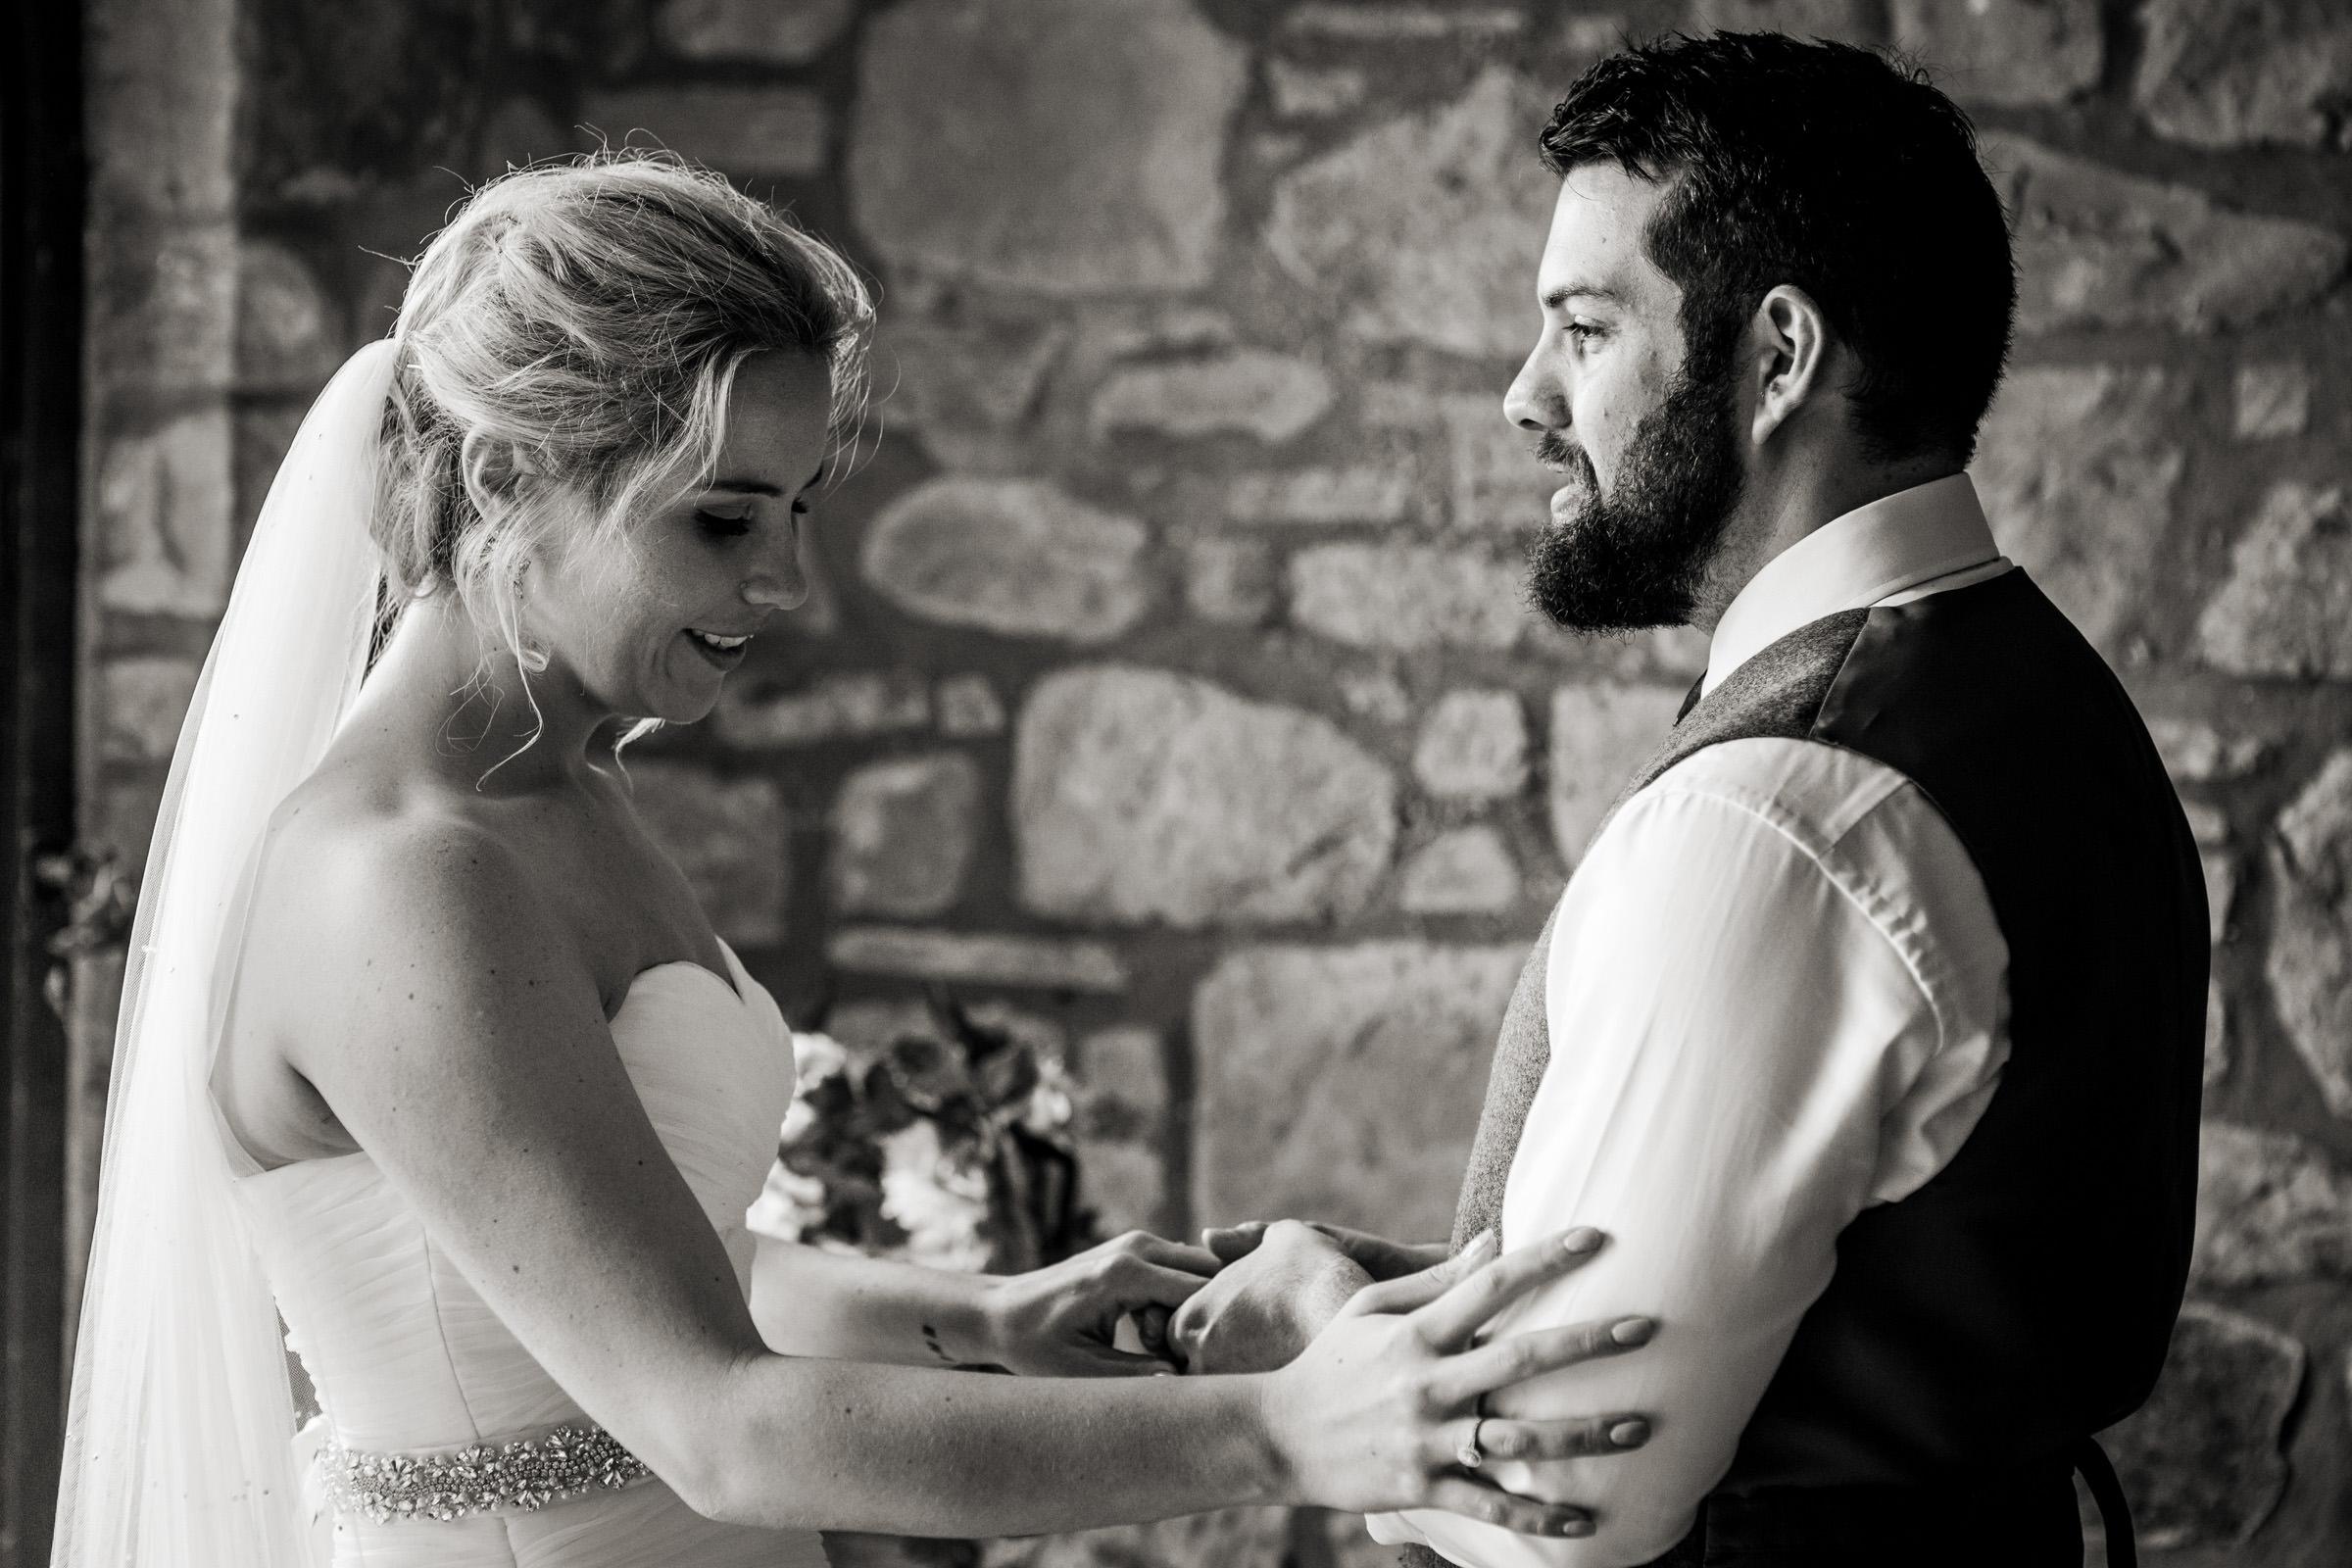 Documentart wedding photographers Berwick-upon-Tweed 008.jpg